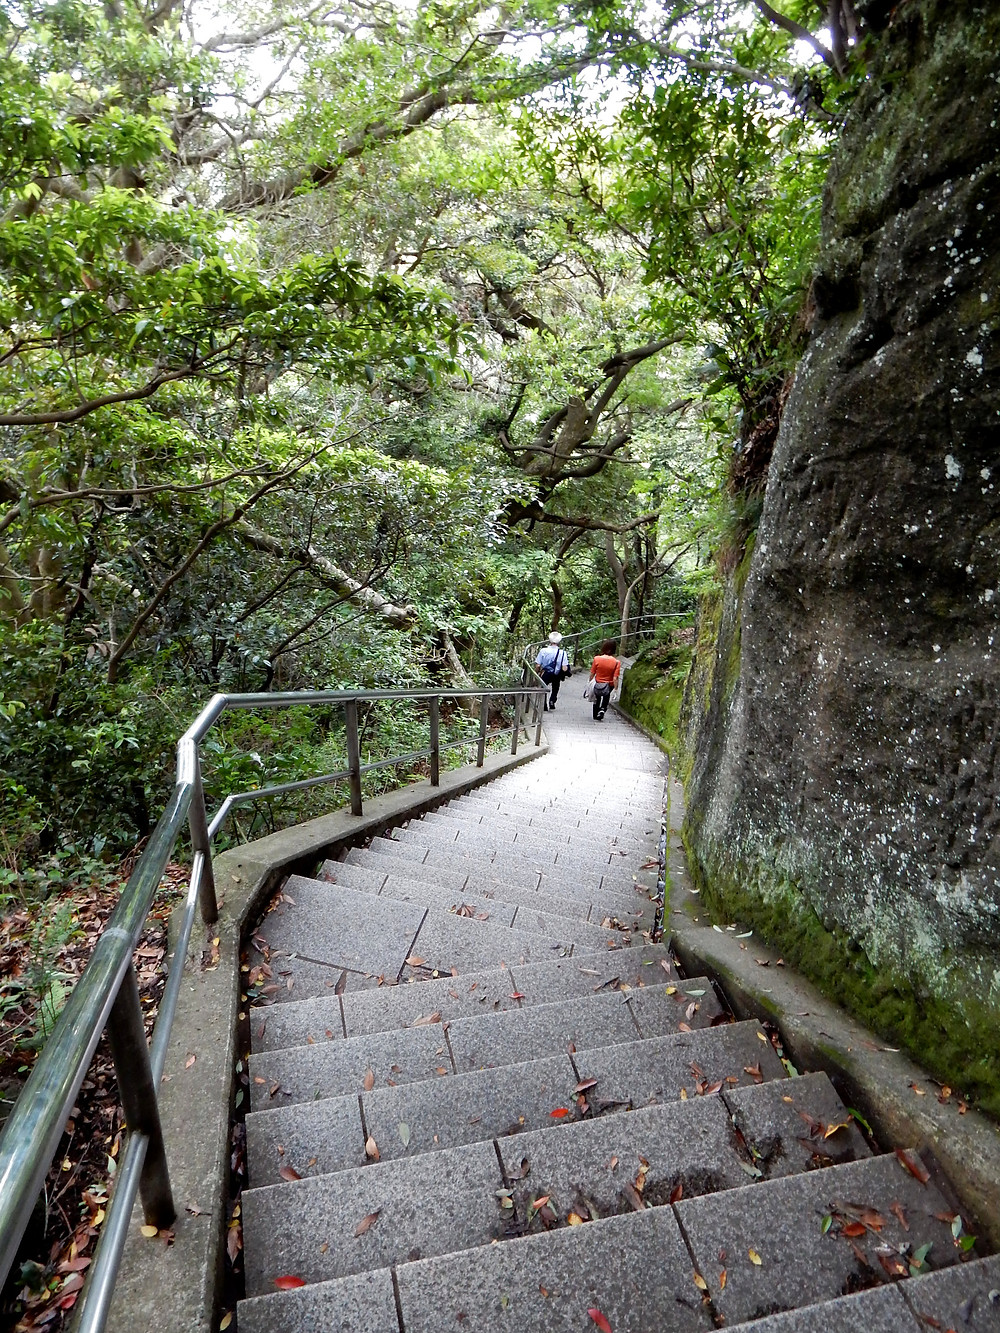 Modern staircase running across the cliffs.